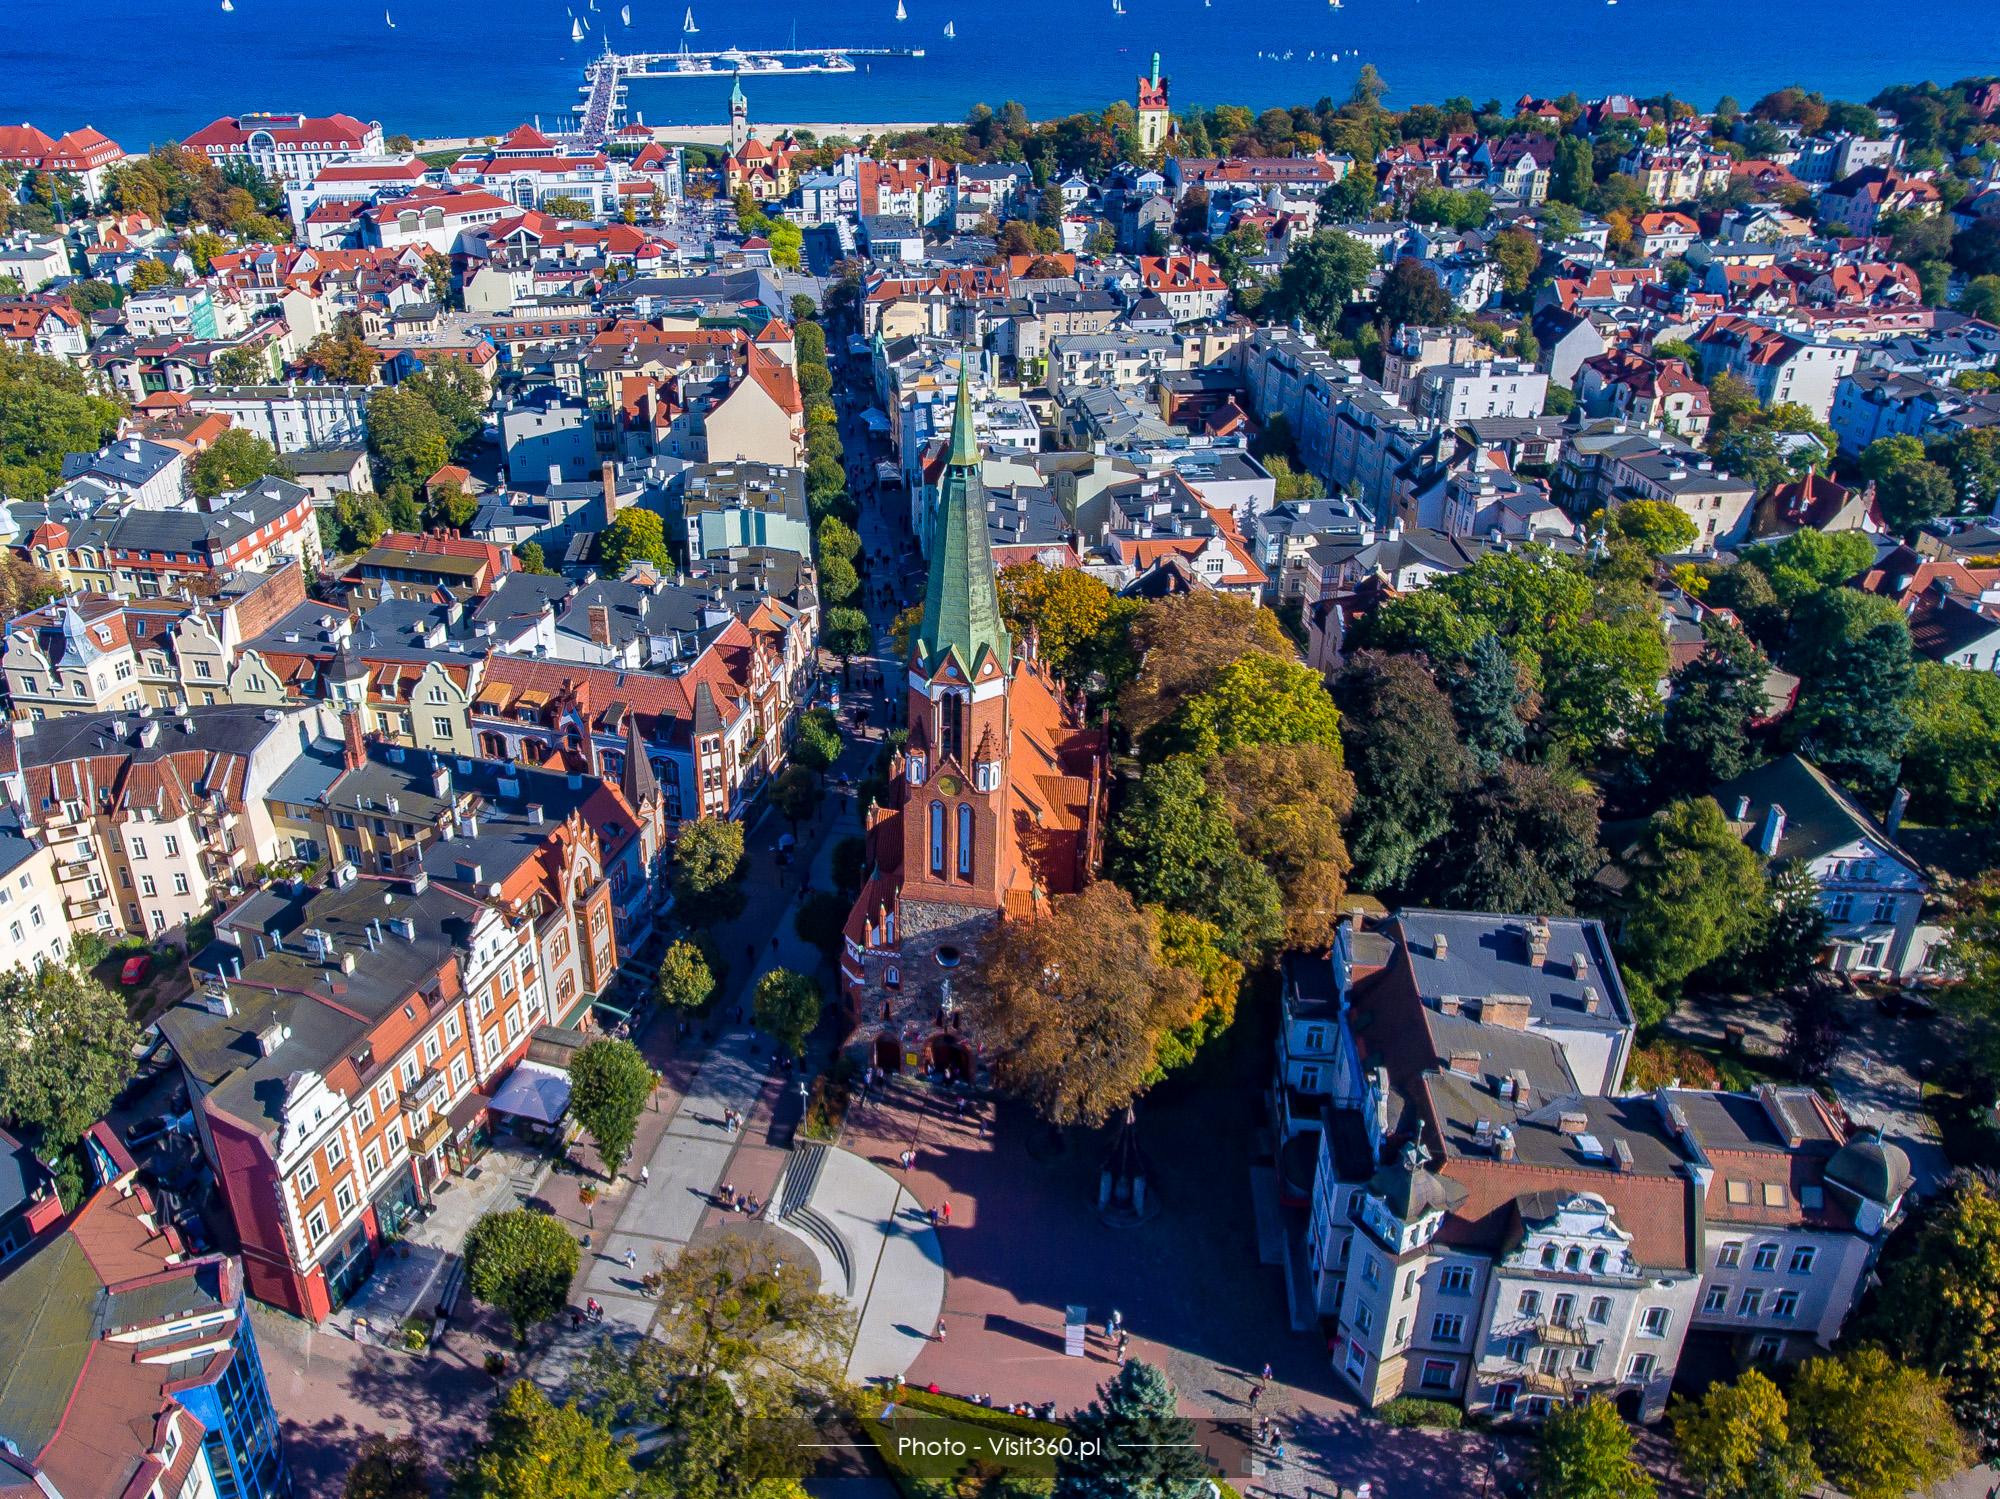 Visit360_pl_Sopot_zdjecia_z_drona_20181006_0241